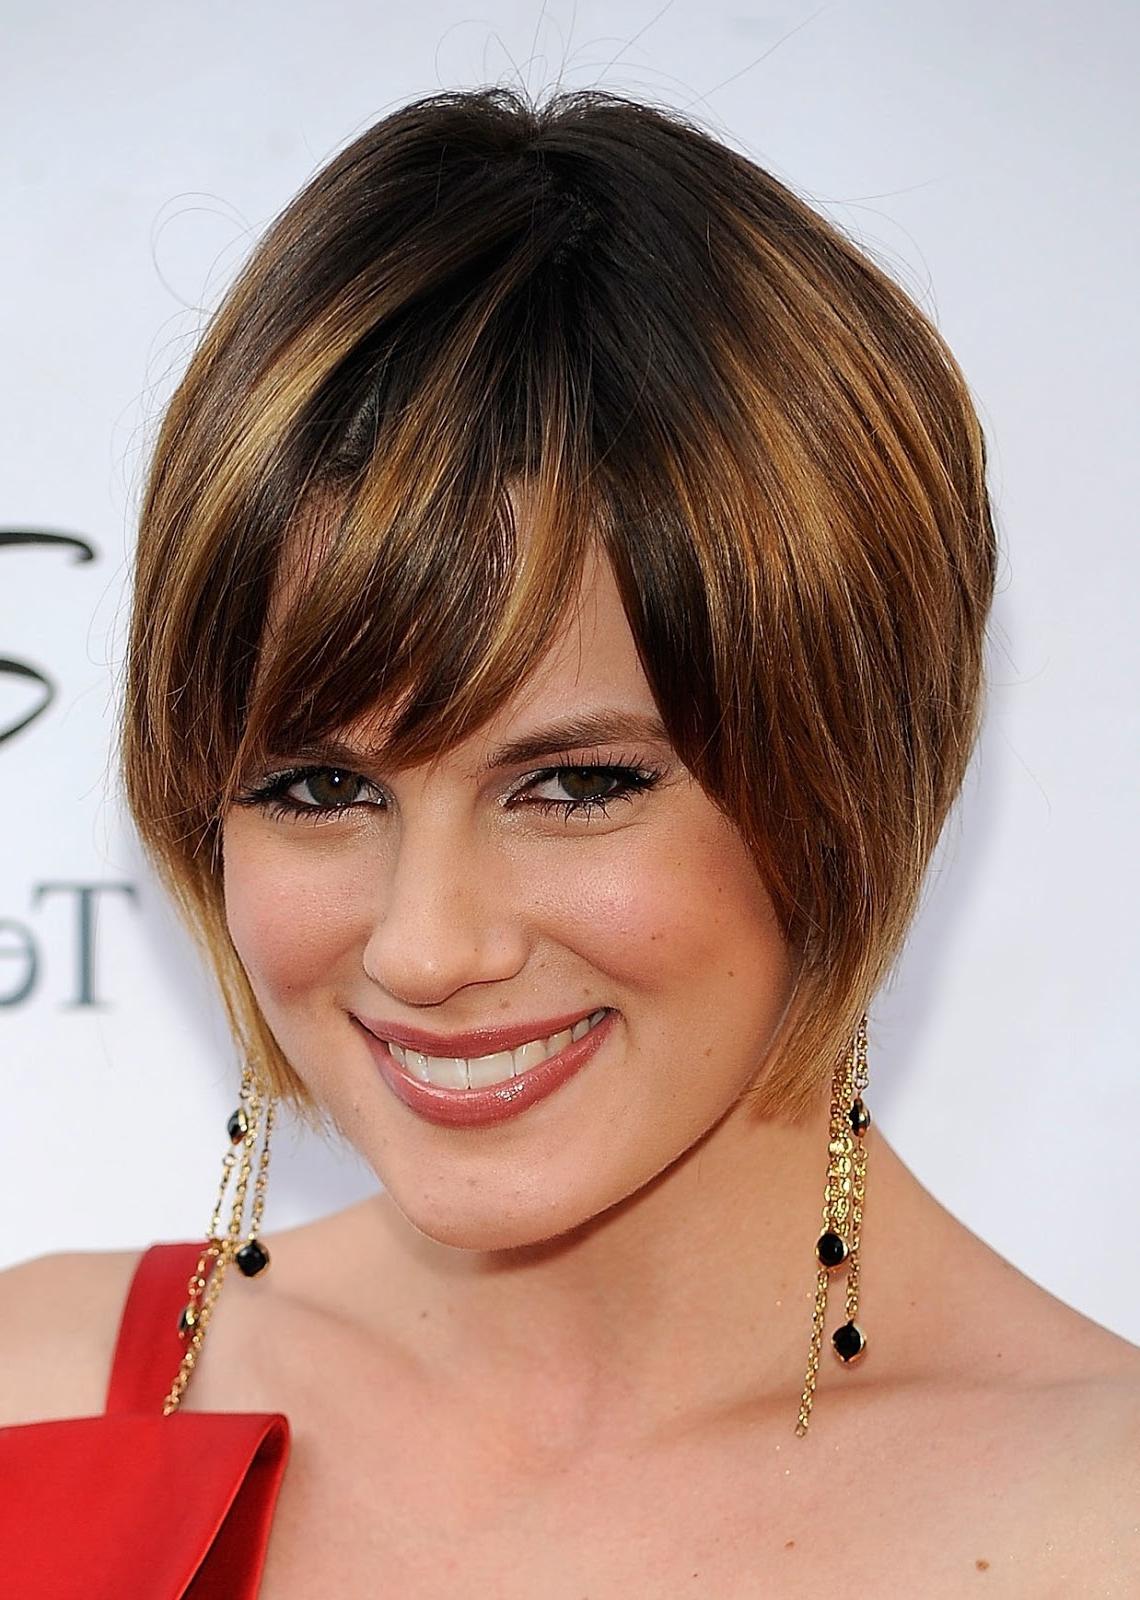 Inverted Short Bob Haircuts Pertaining To Inverted Short Haircuts (View 23 of 25)